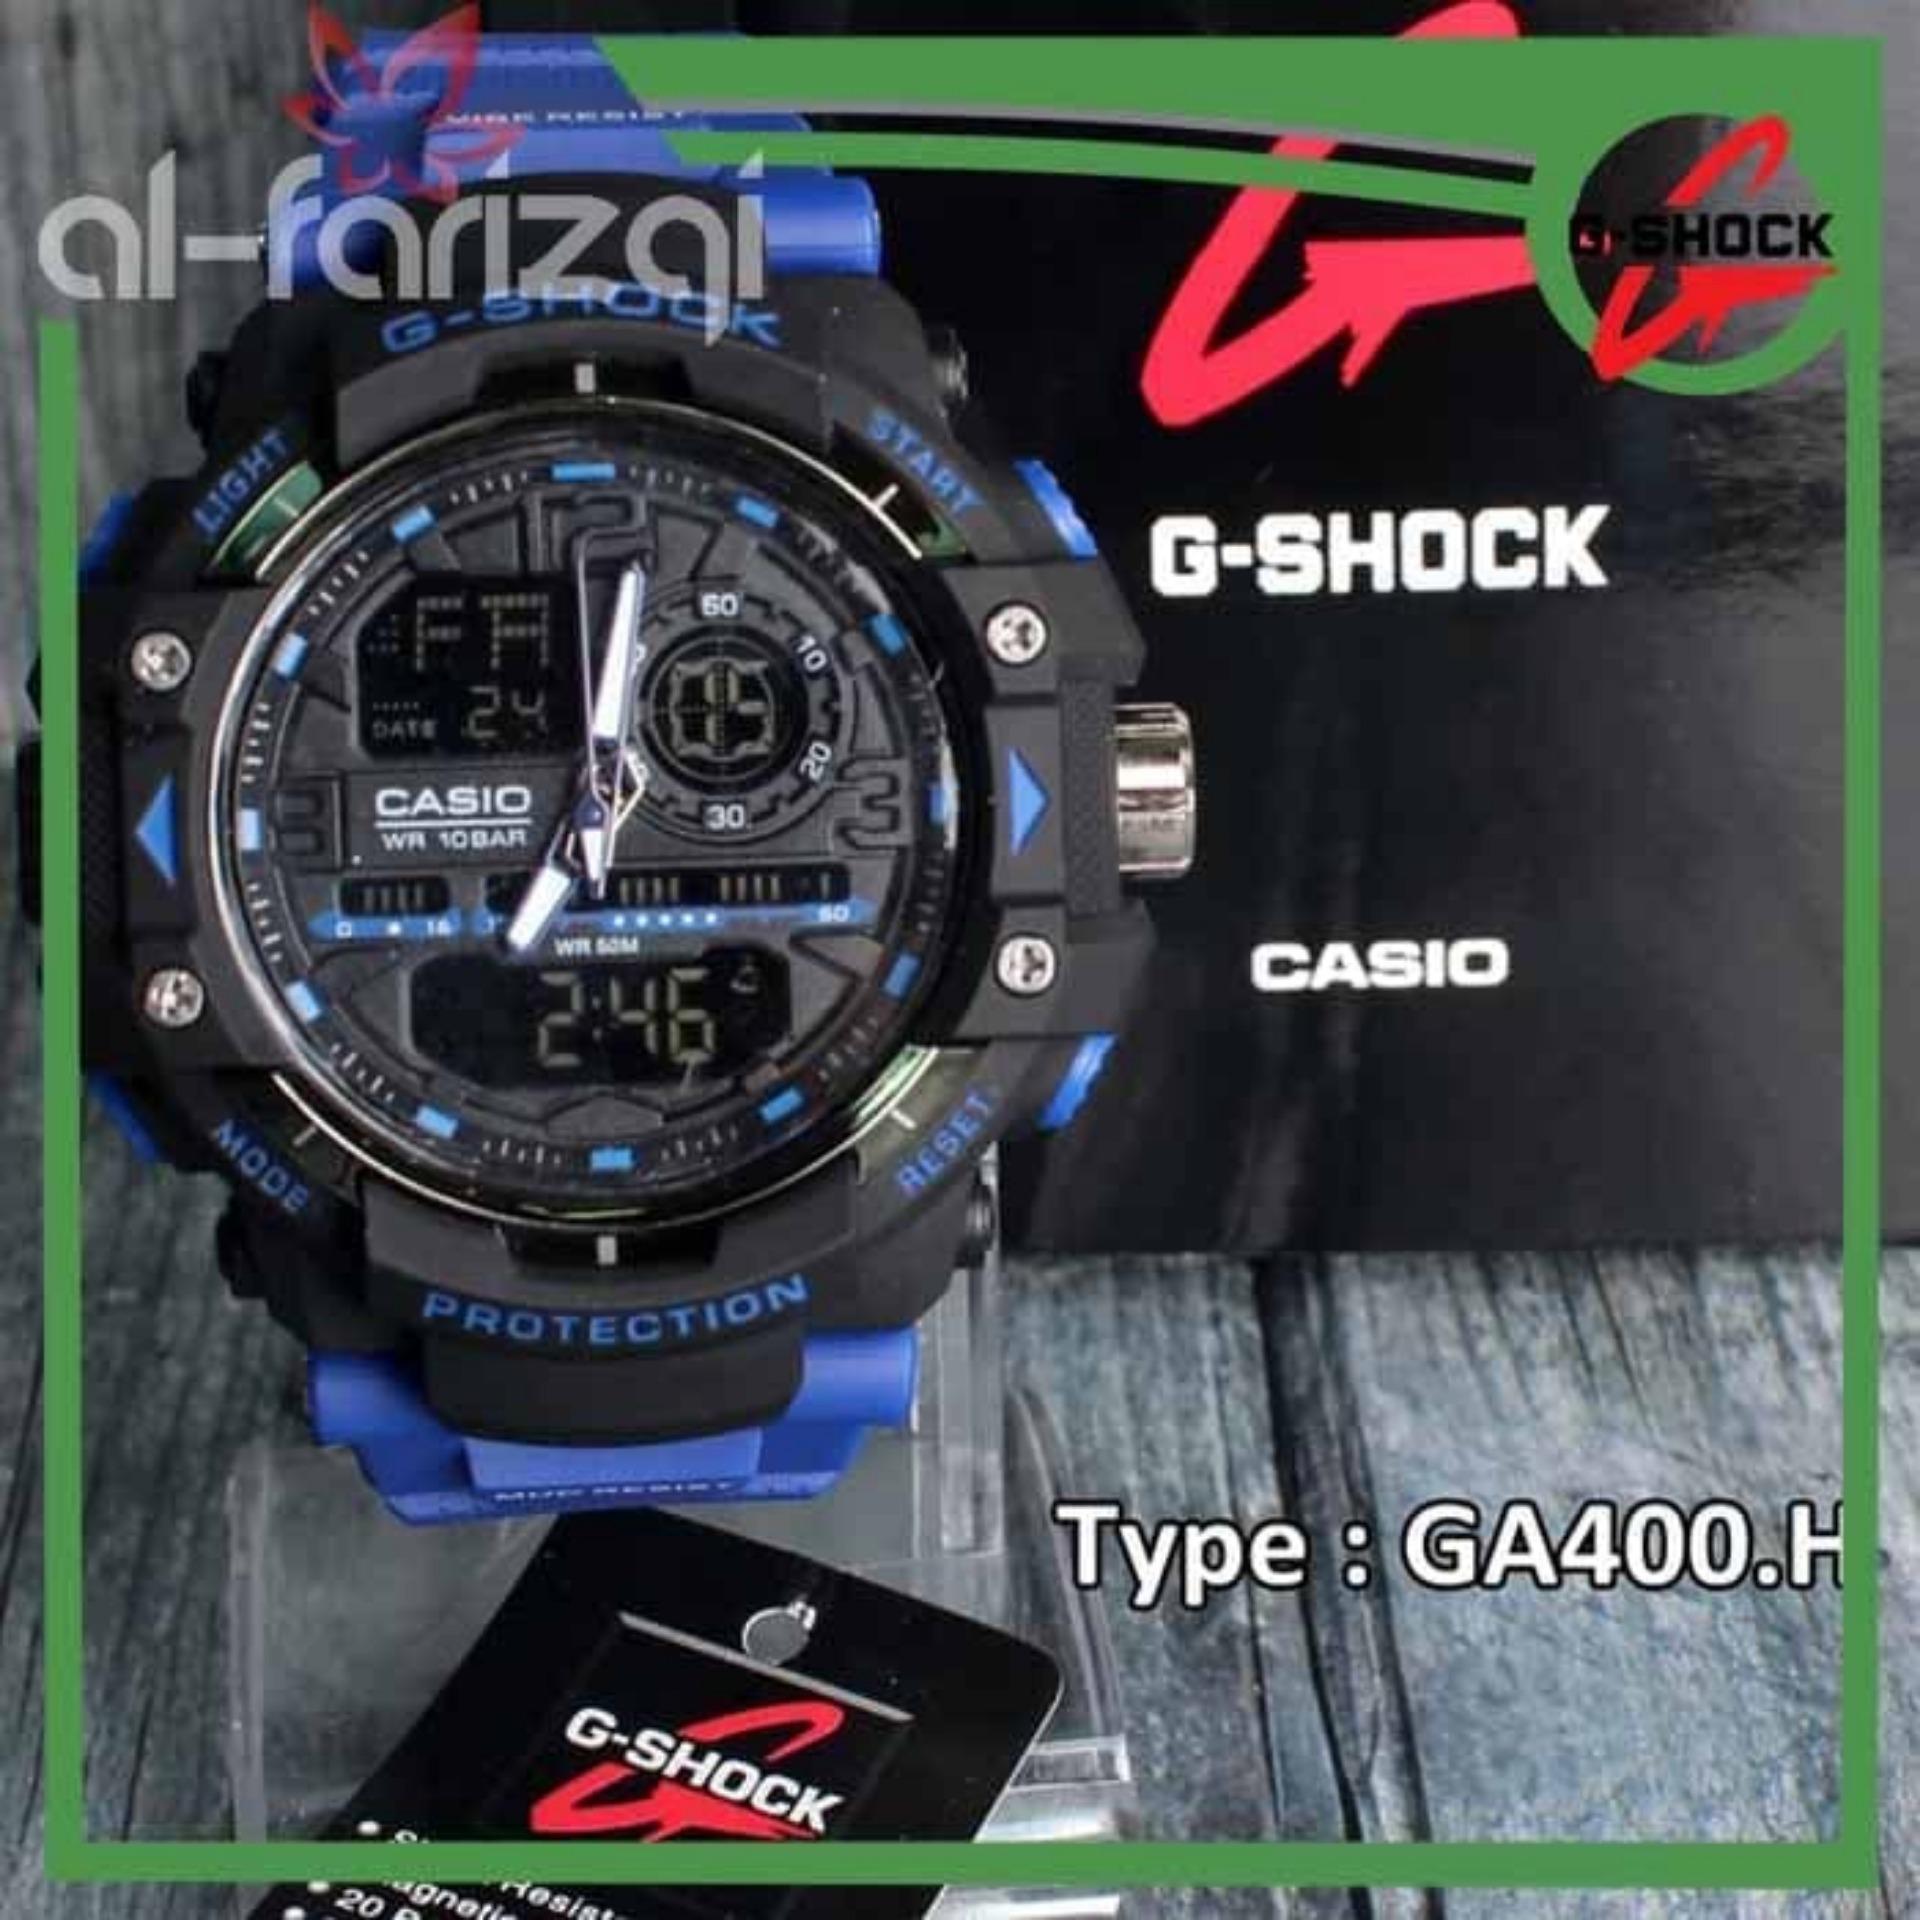 Jam Tangan Casio G-Shock Dual Time Digital Sporty Outdoor Skmei Eiger